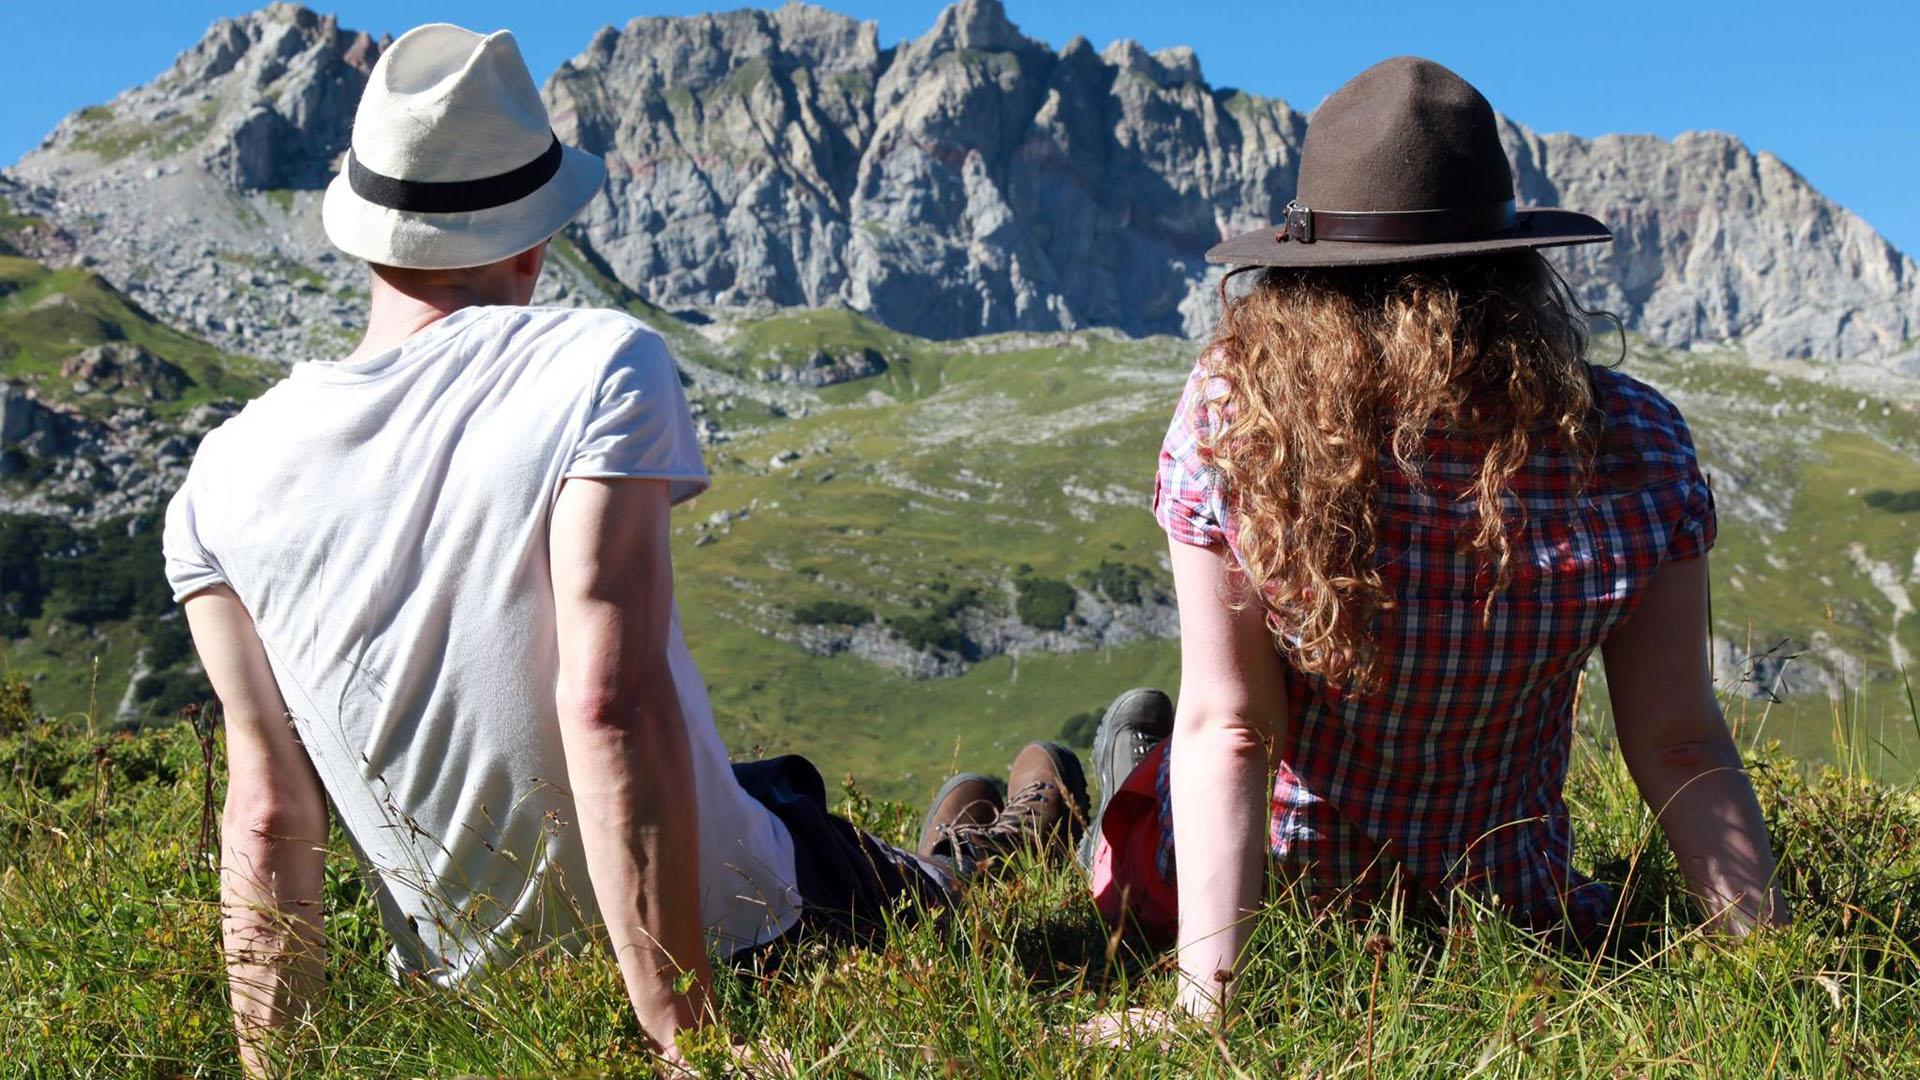 Singles enjoy nature